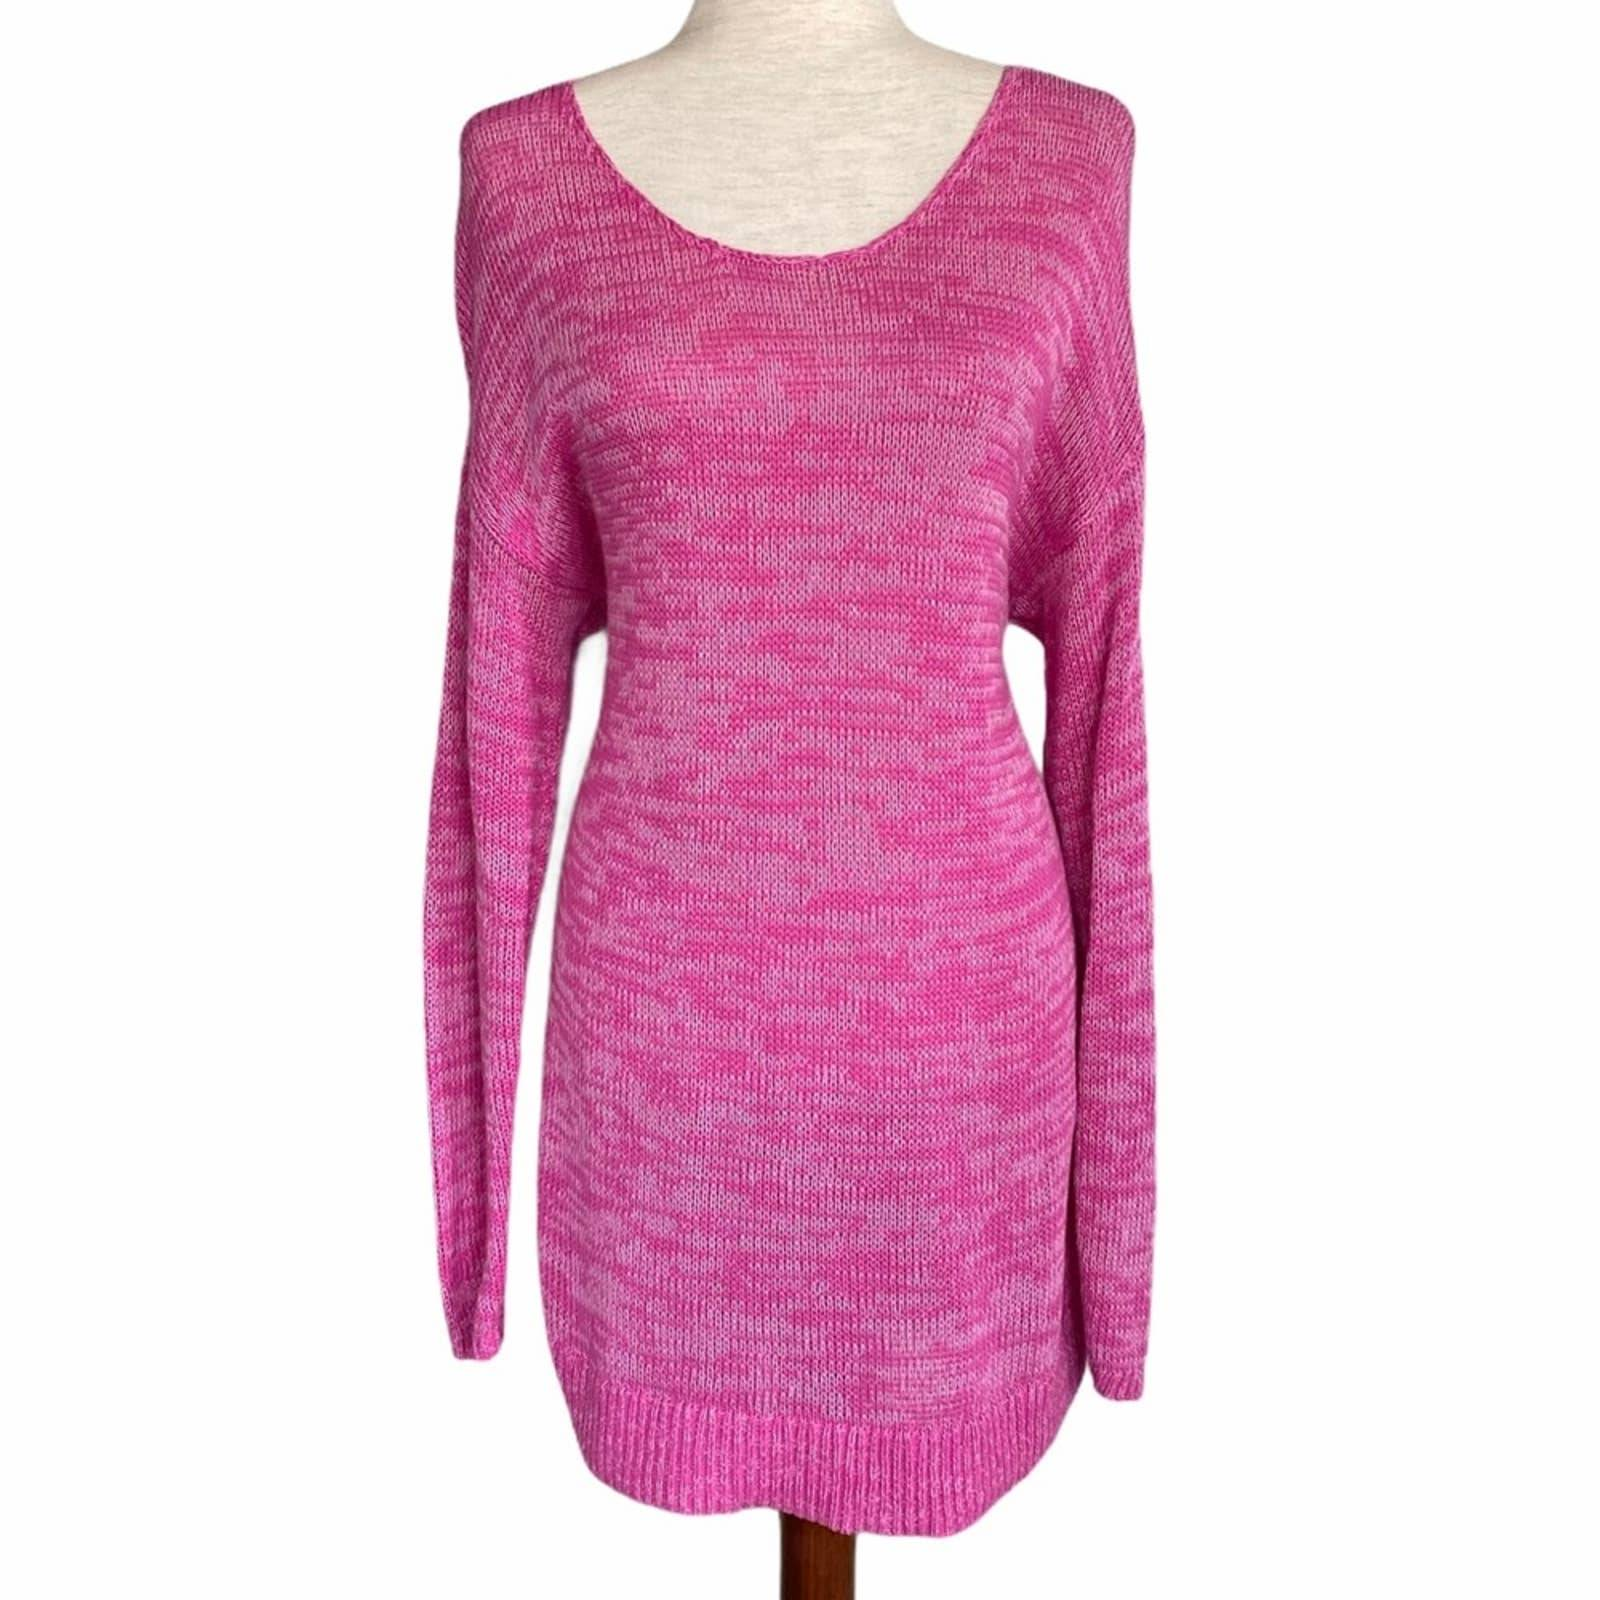 GAP Knit Scoop Neck Tunic XL Pink